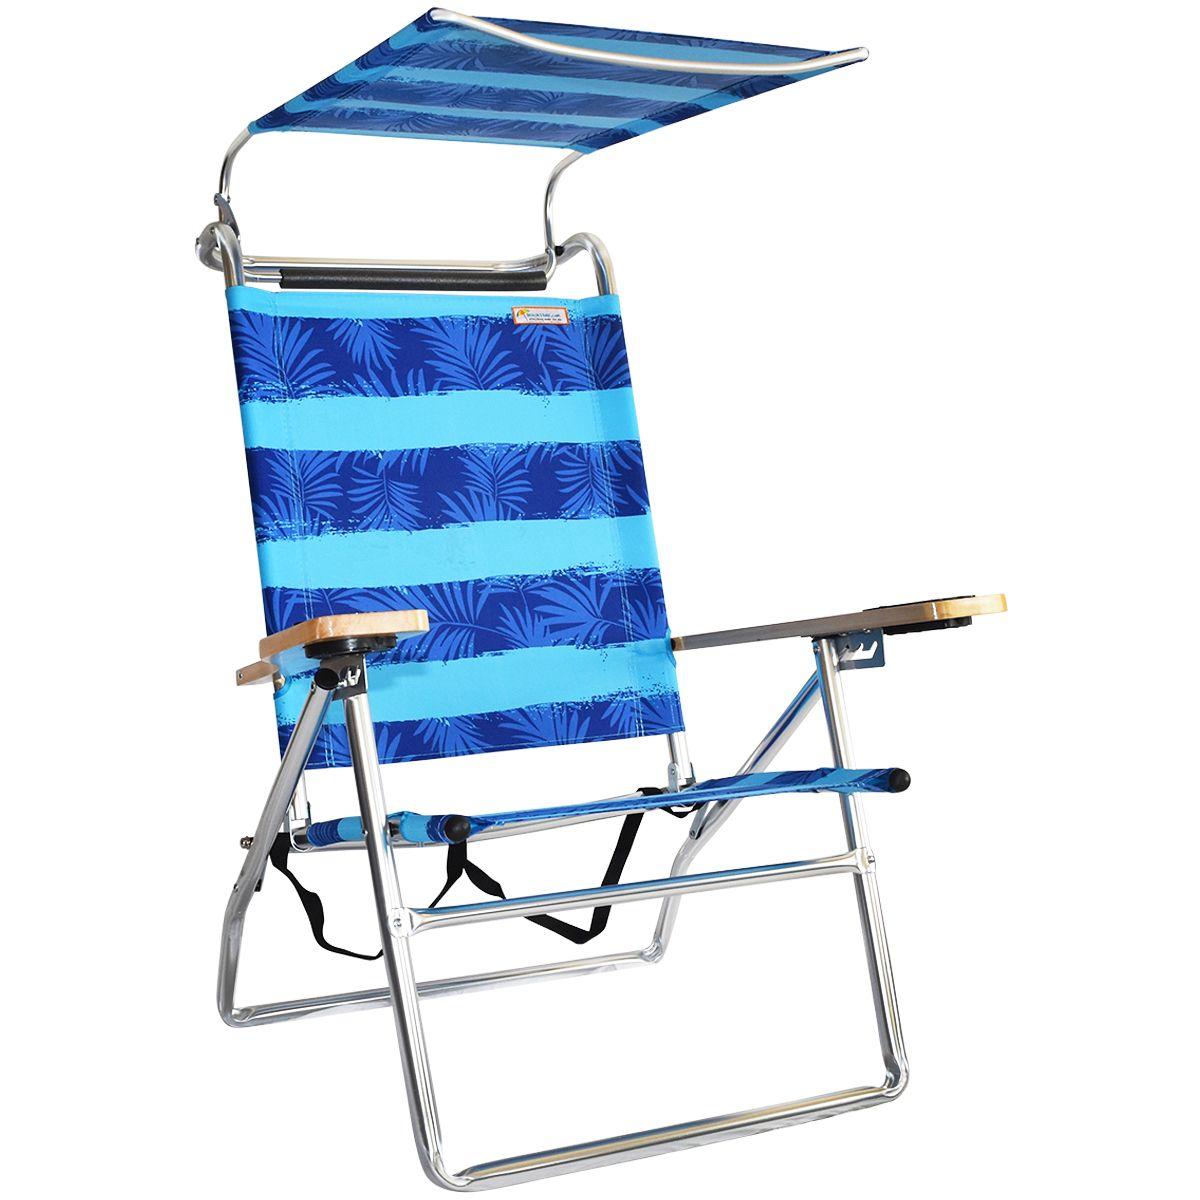 Canopy Hi Seat Aluminum Beach Chair Blue Fern Canopy